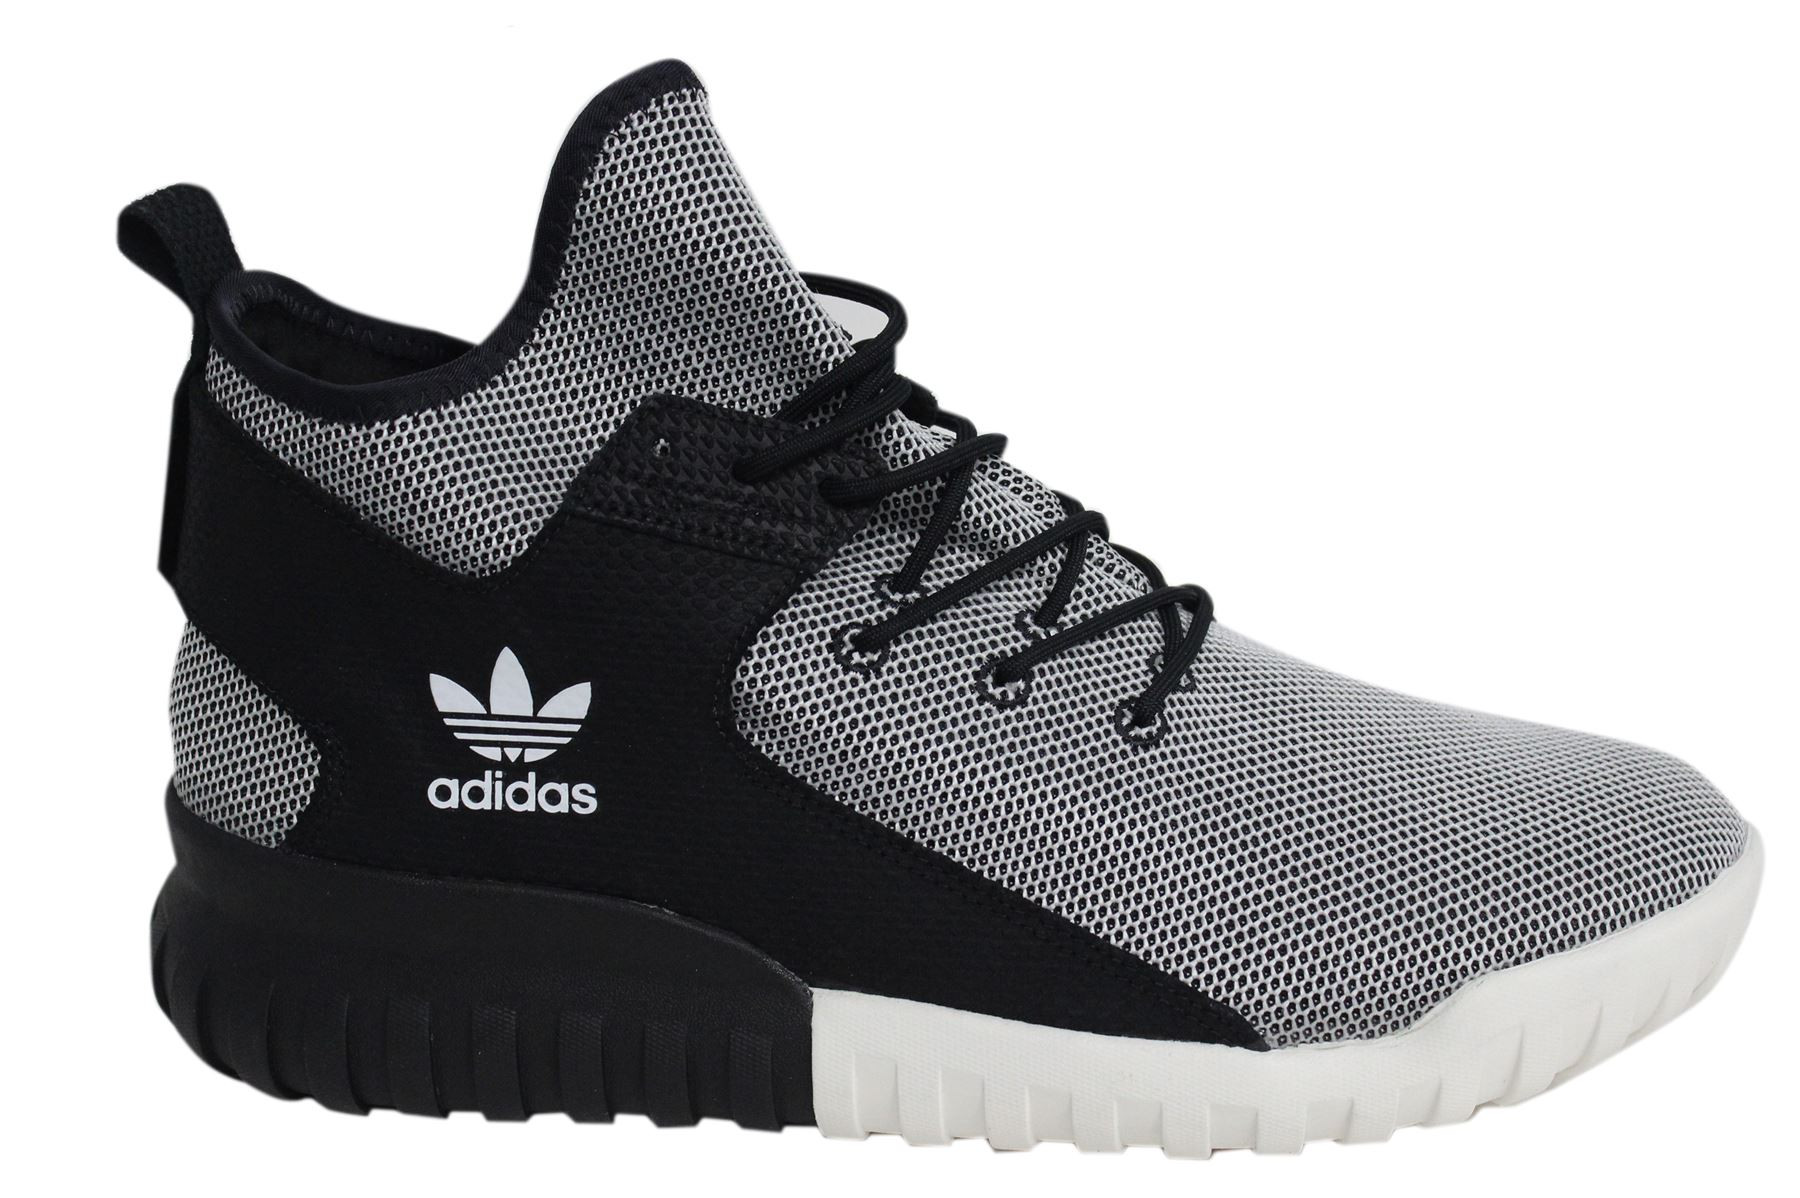 Adidas Tubular X Lace Up Black White Mens Textile Hi Trainers BA7782 D49 | eBay